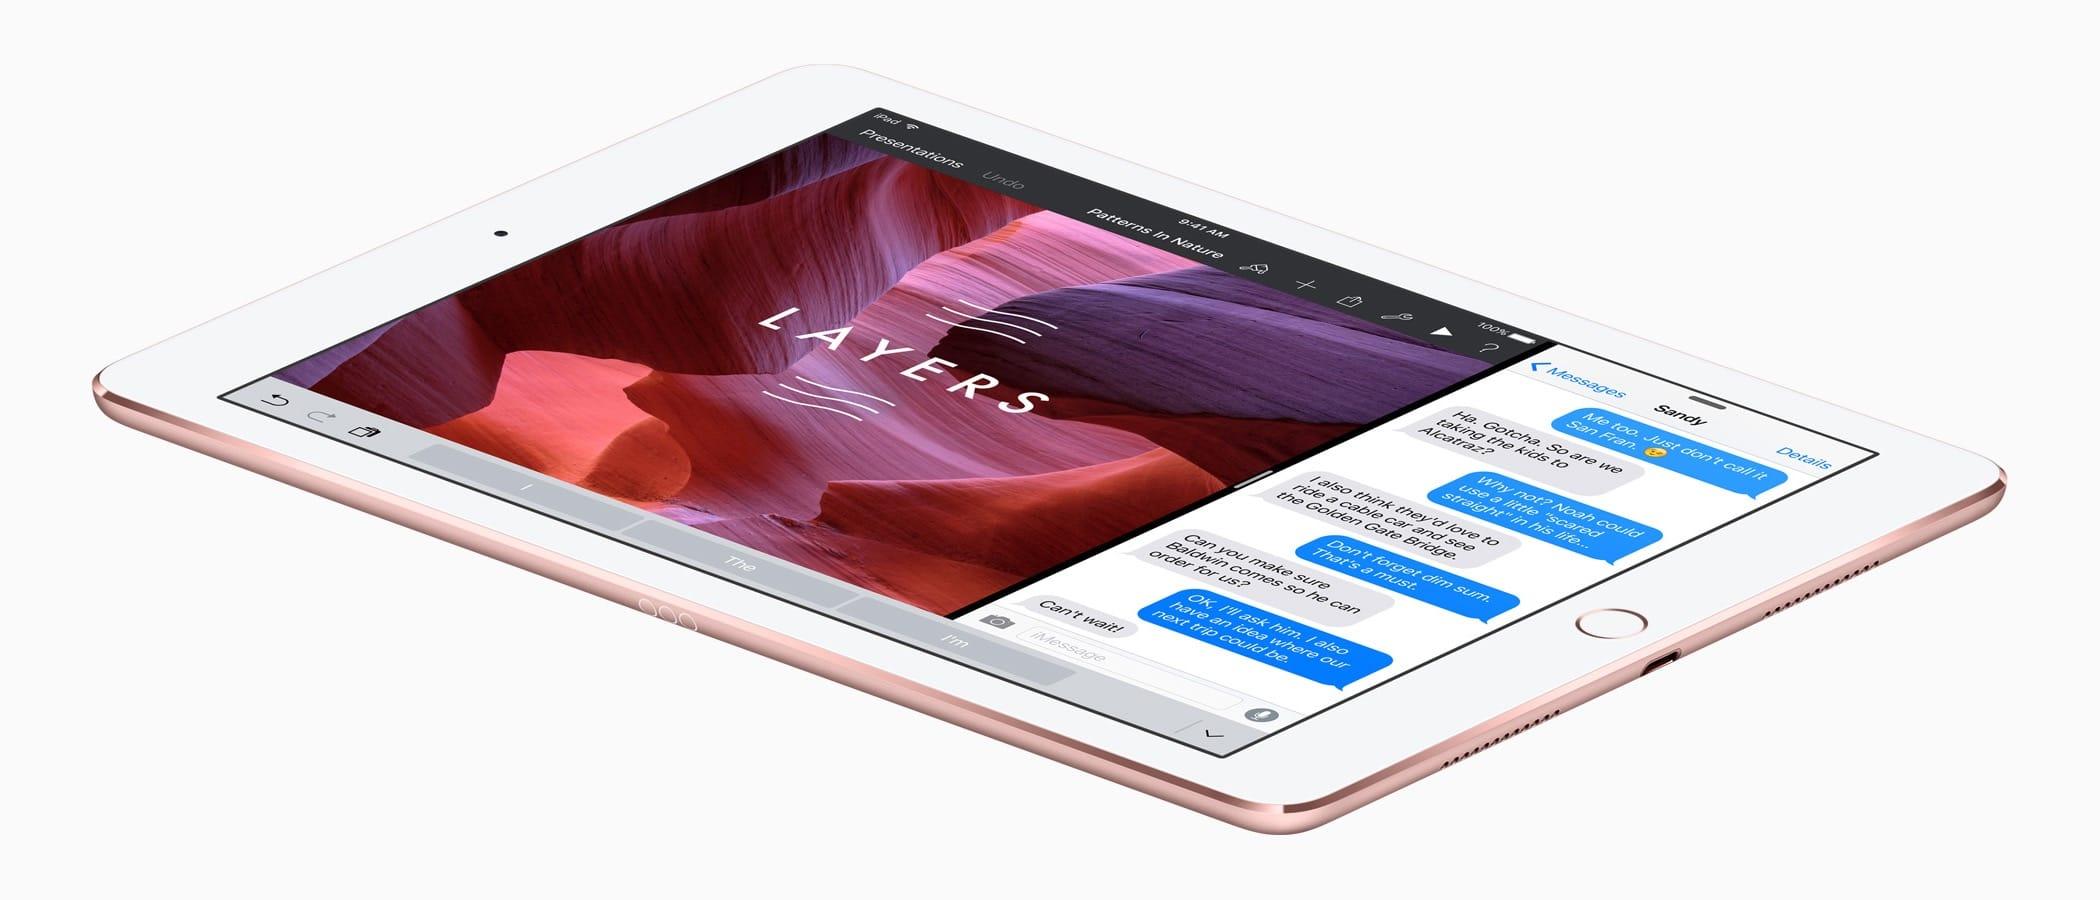 iPad-Pro-9.7-inch-hero